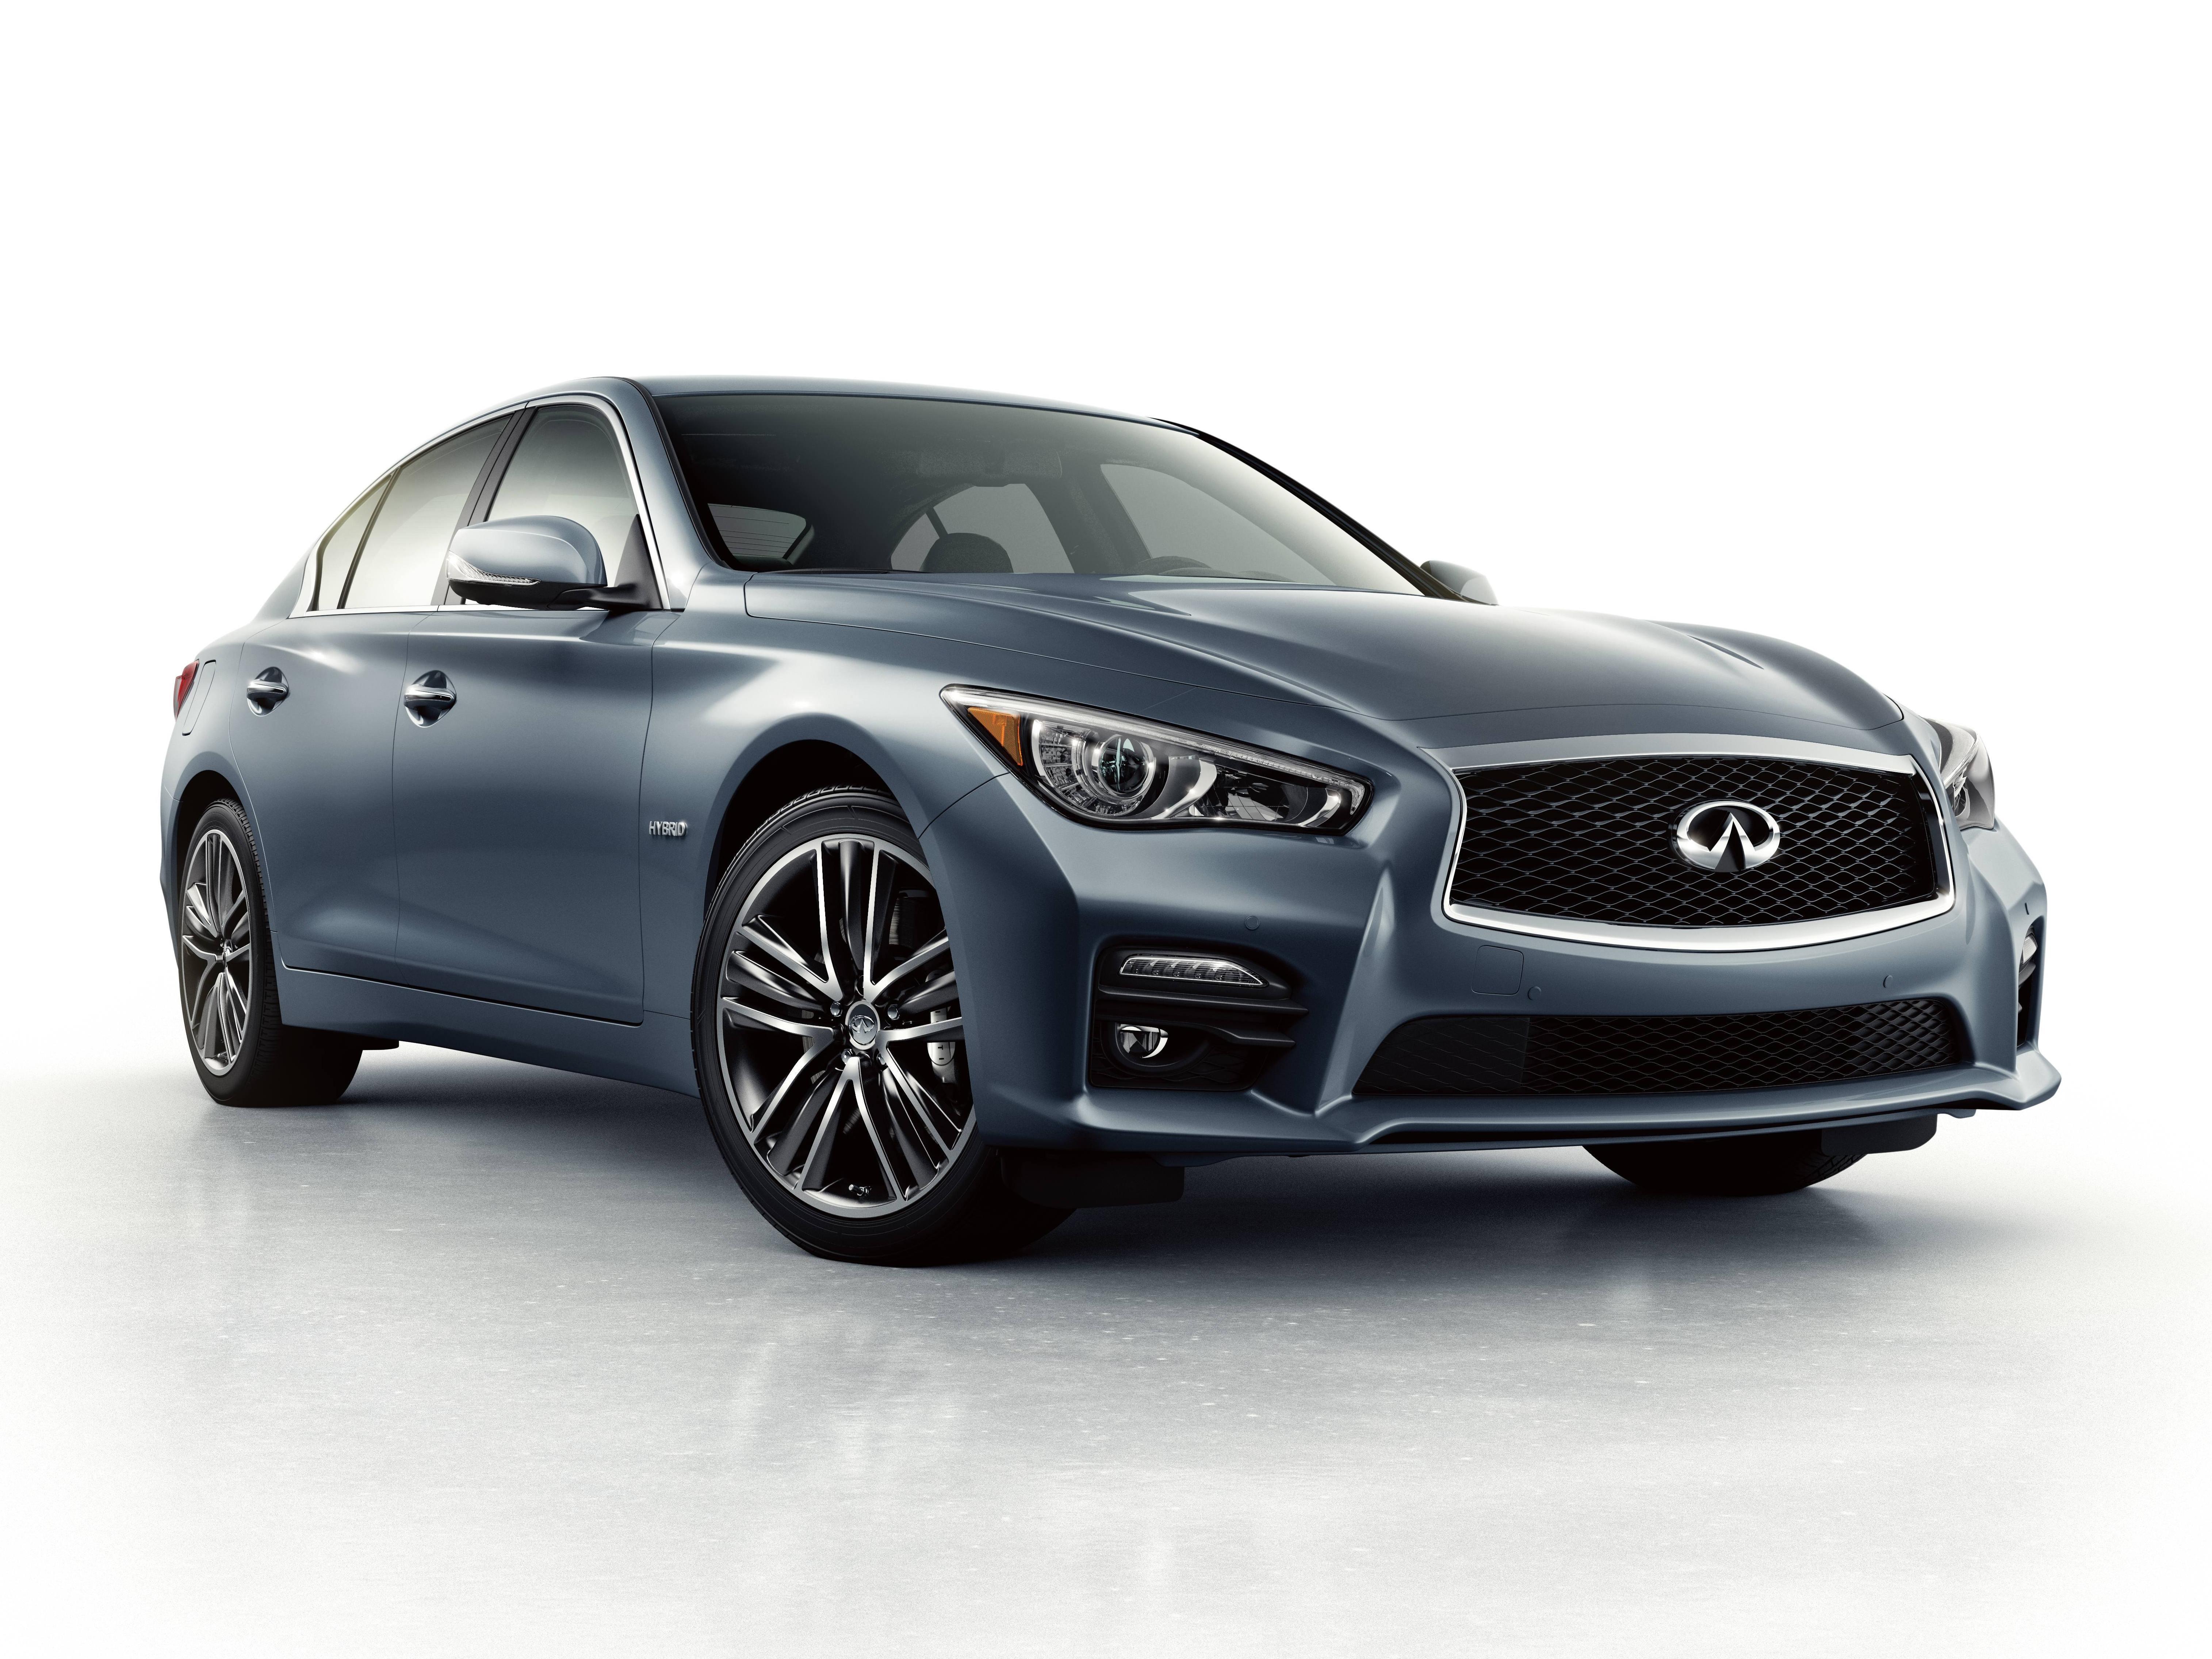 graphite infiniti sedan highlighting led front in fascia headlights pin exterior shadow infinity cars